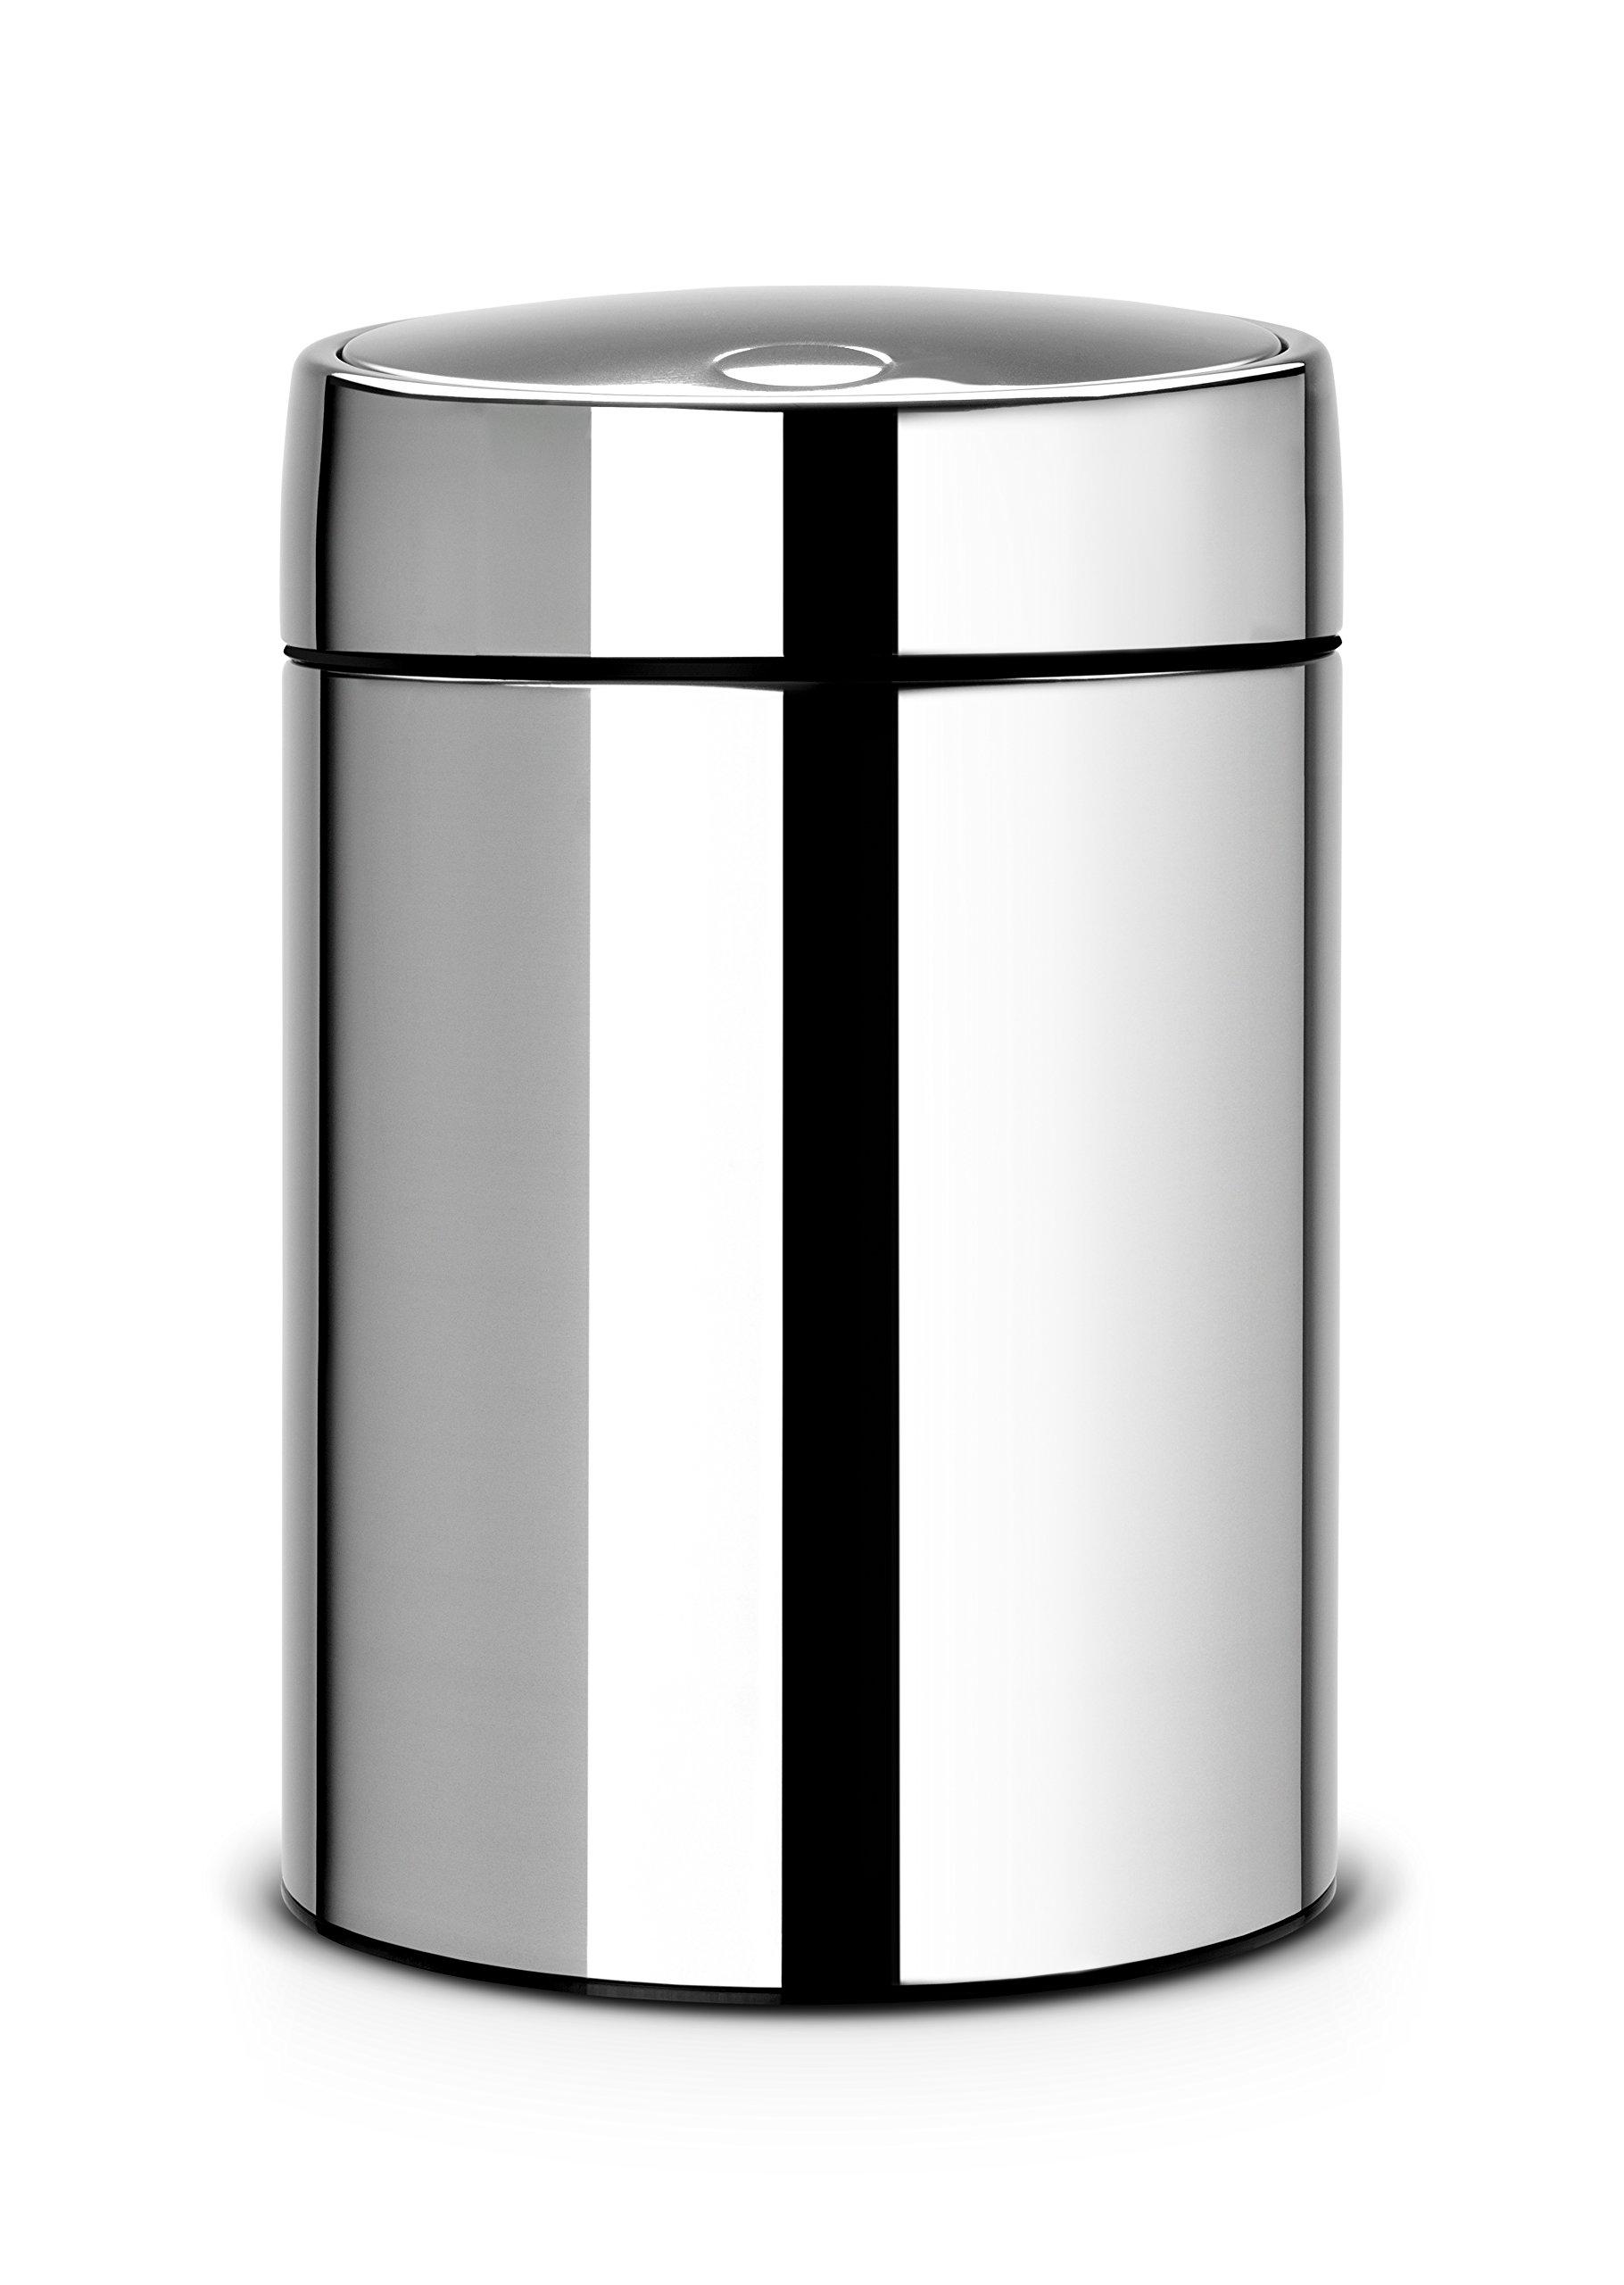 Brabantia Slide Bin, 5 L - Brilliant Steel